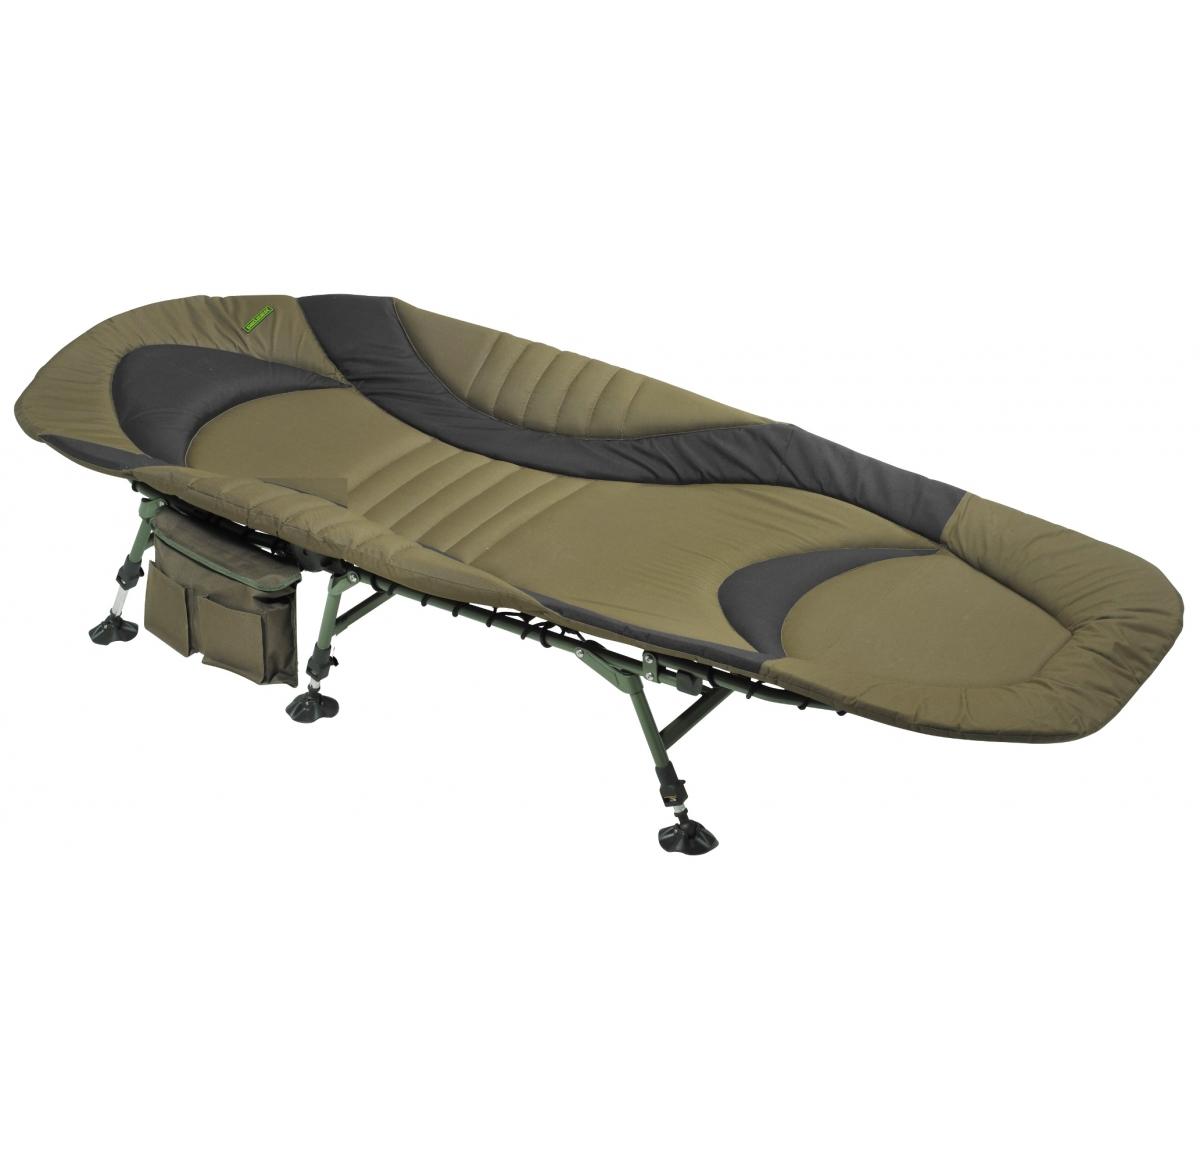 Pelzer Compact Bed Chair II 205x80 6legs